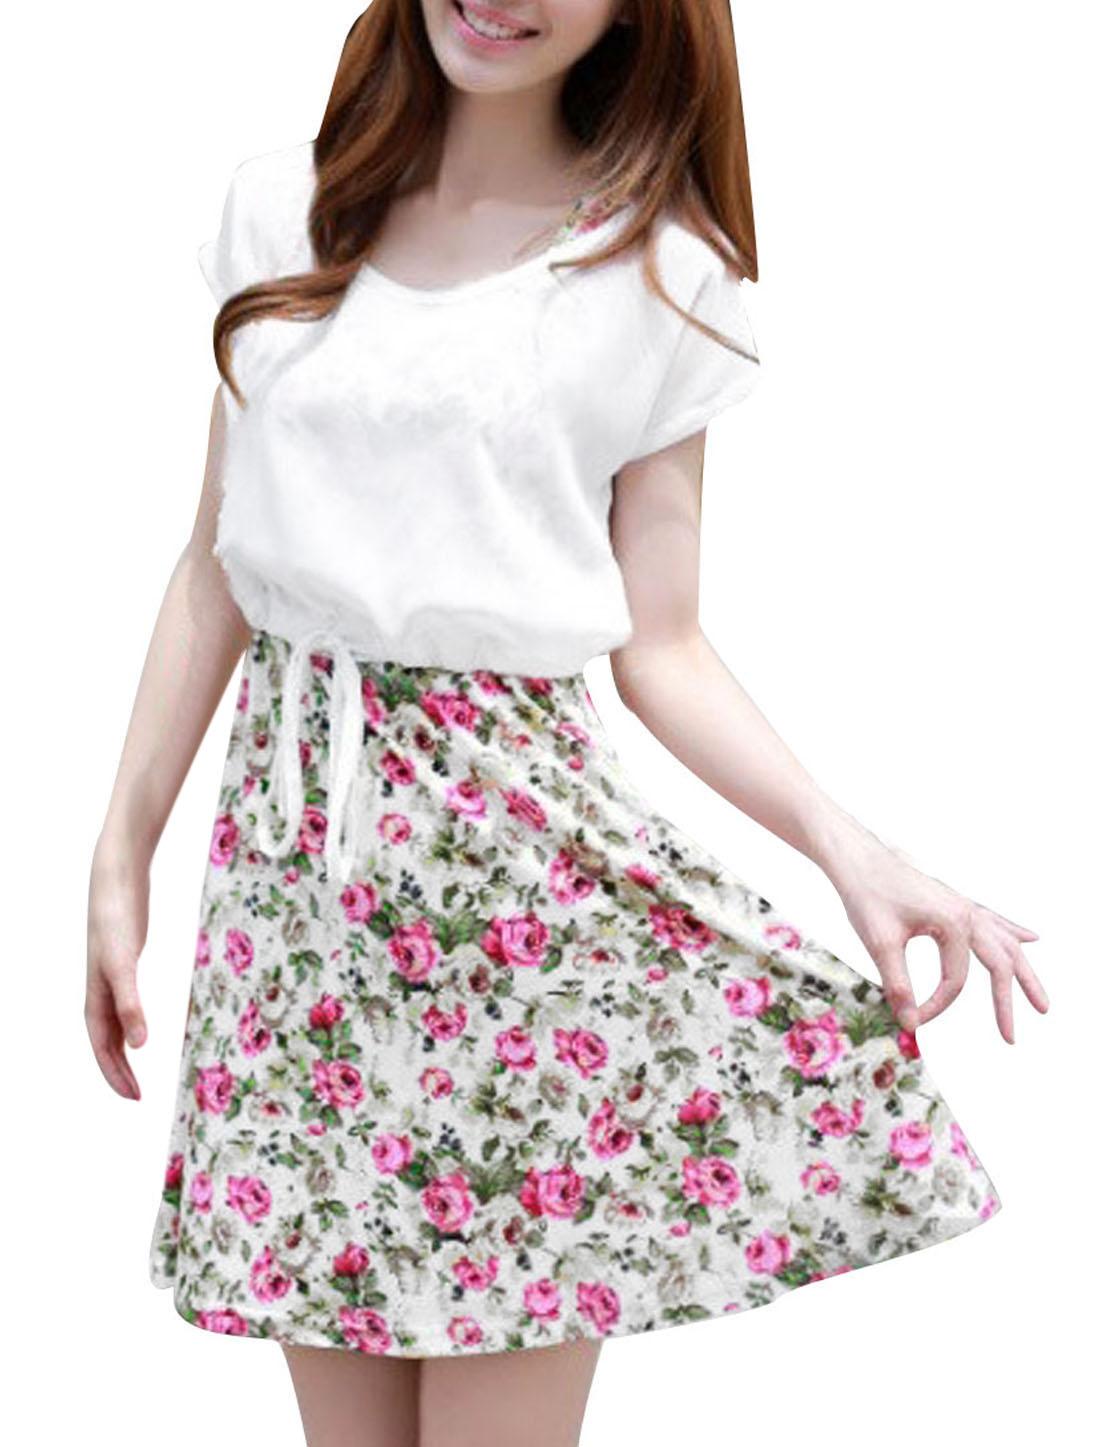 Women Semi Sheer Dolman Sleeve Top w Sleeveless Round Neck Dress XS White